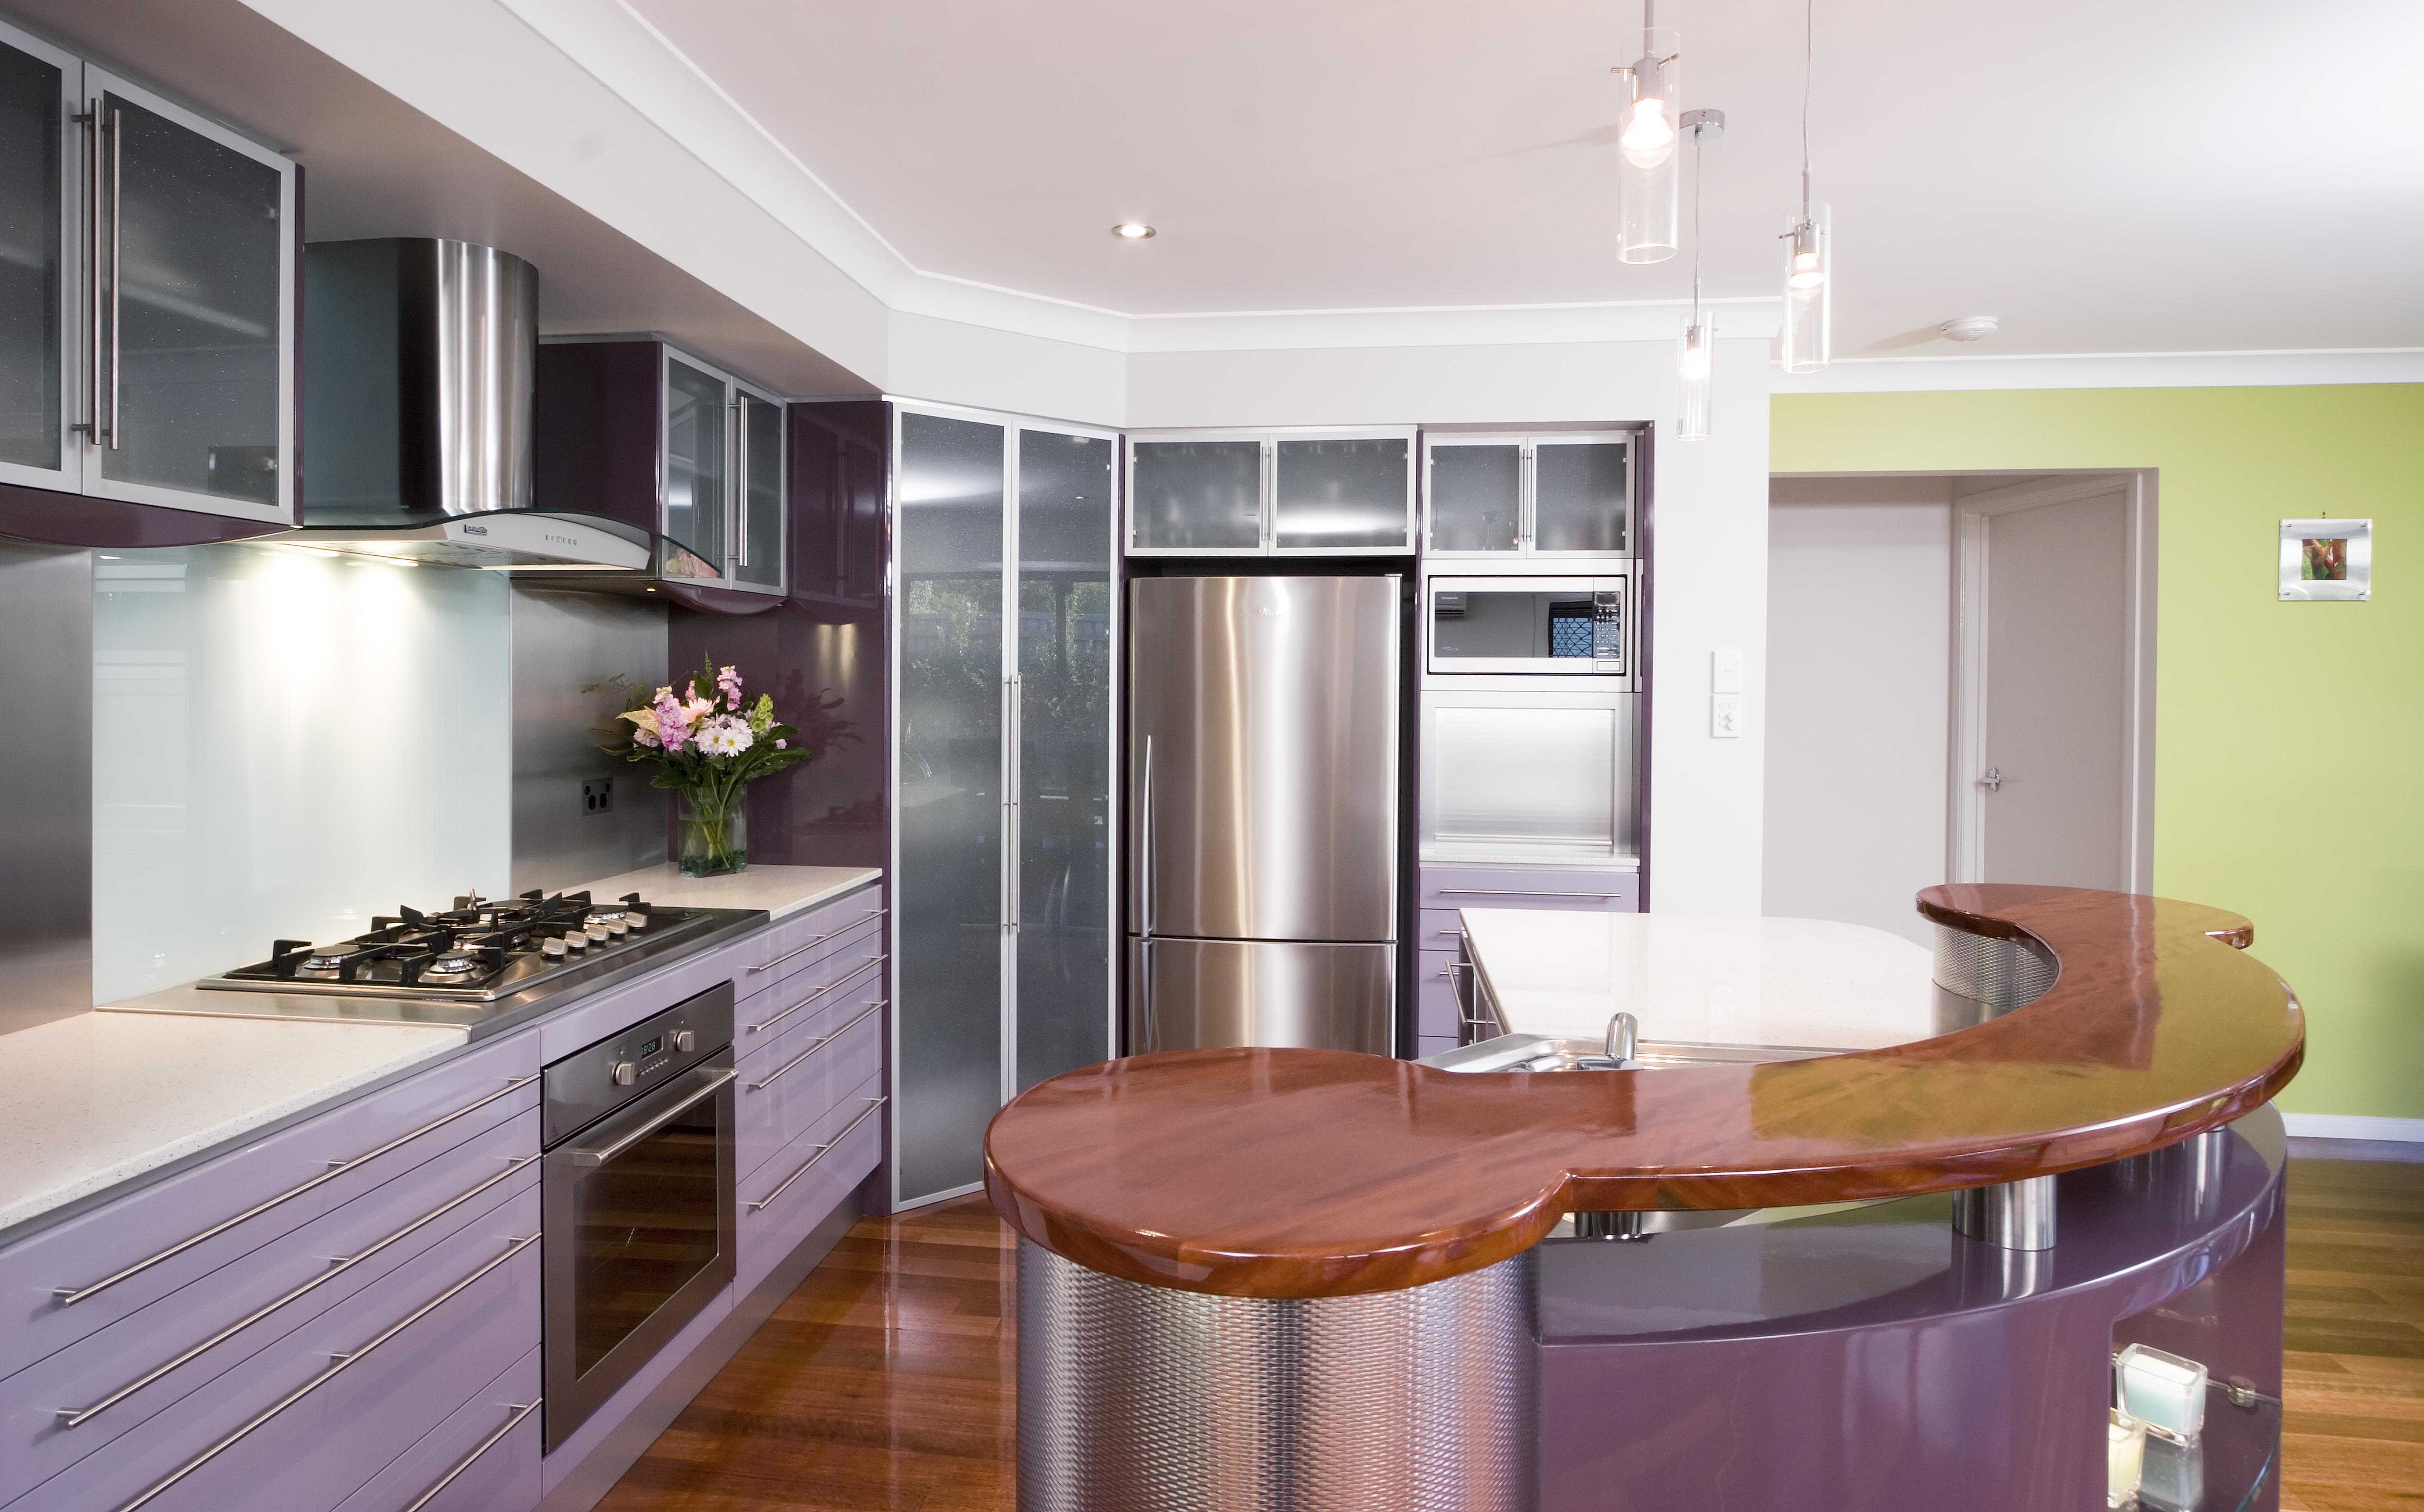 New kitchen renovation chapel hill sublime architectural interiors